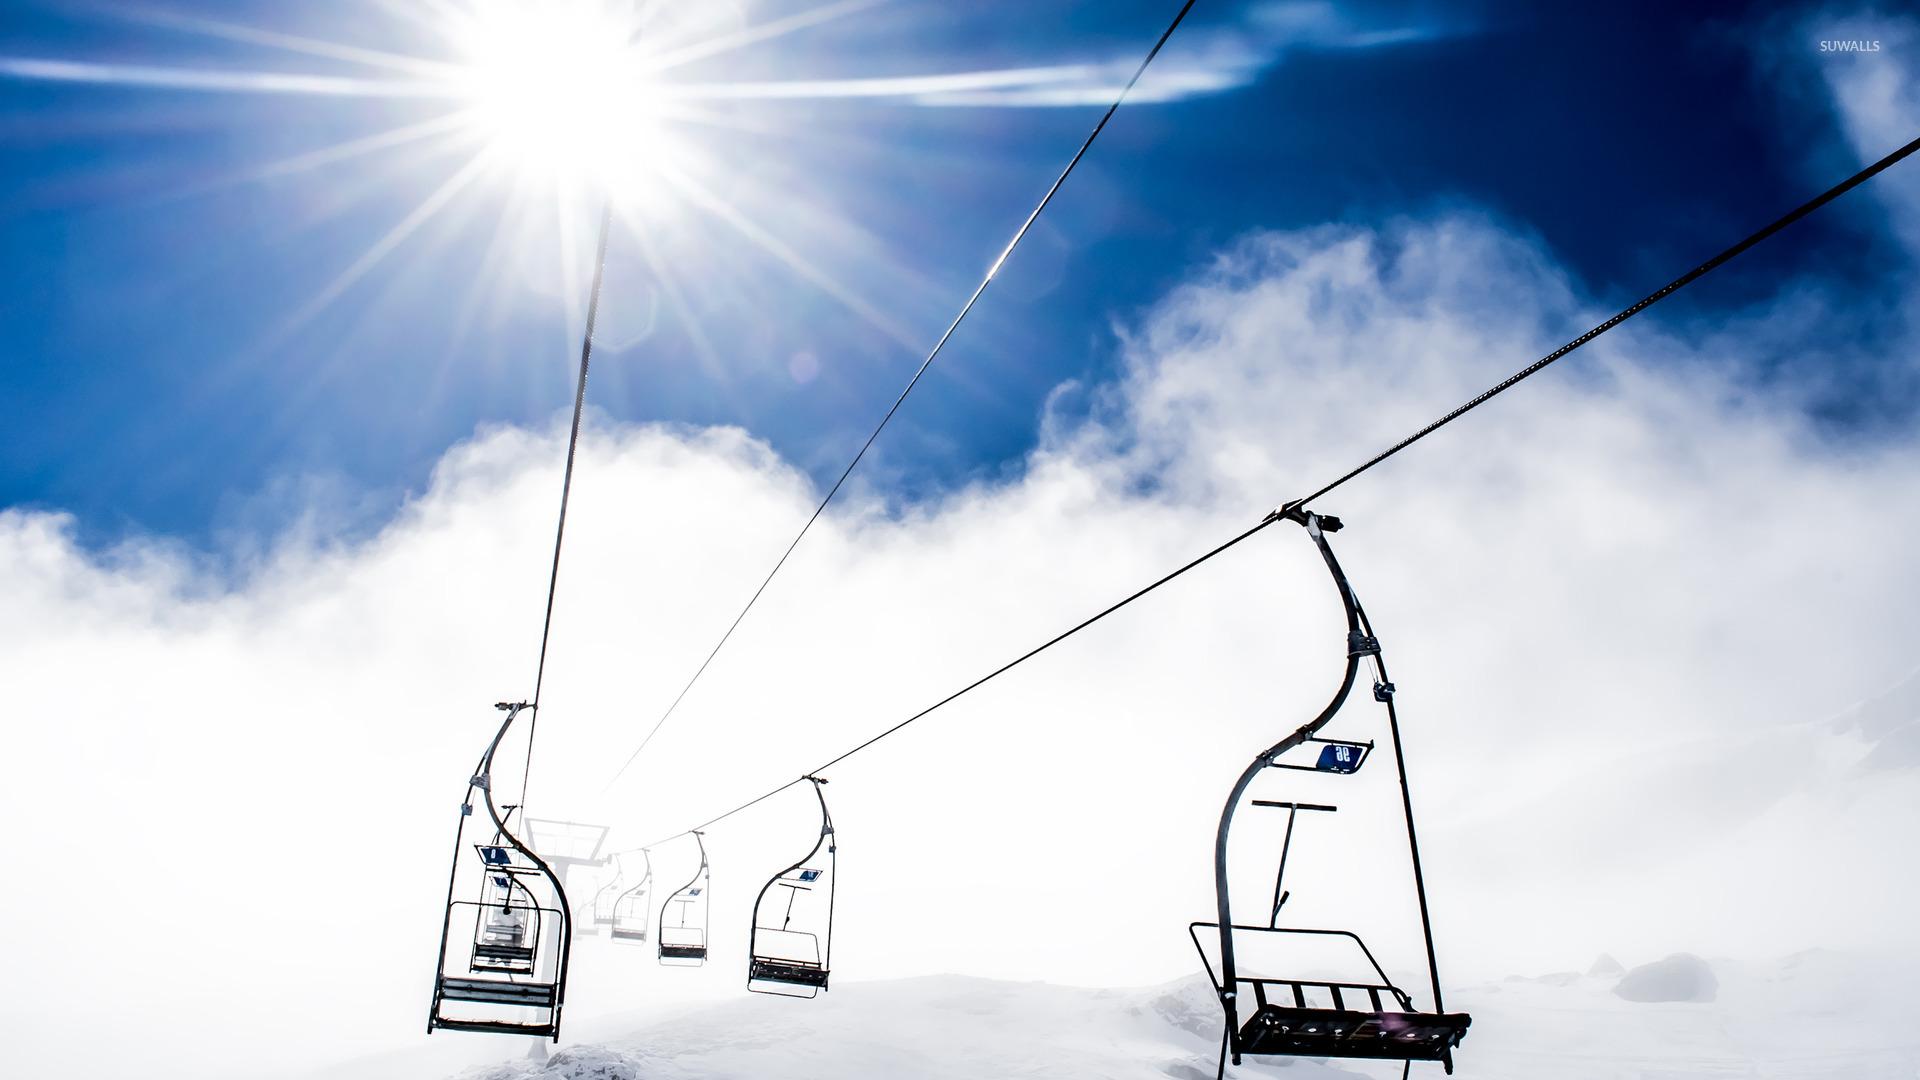 Ski resort wallpaper   Photography wallpapers   16938 1920x1080